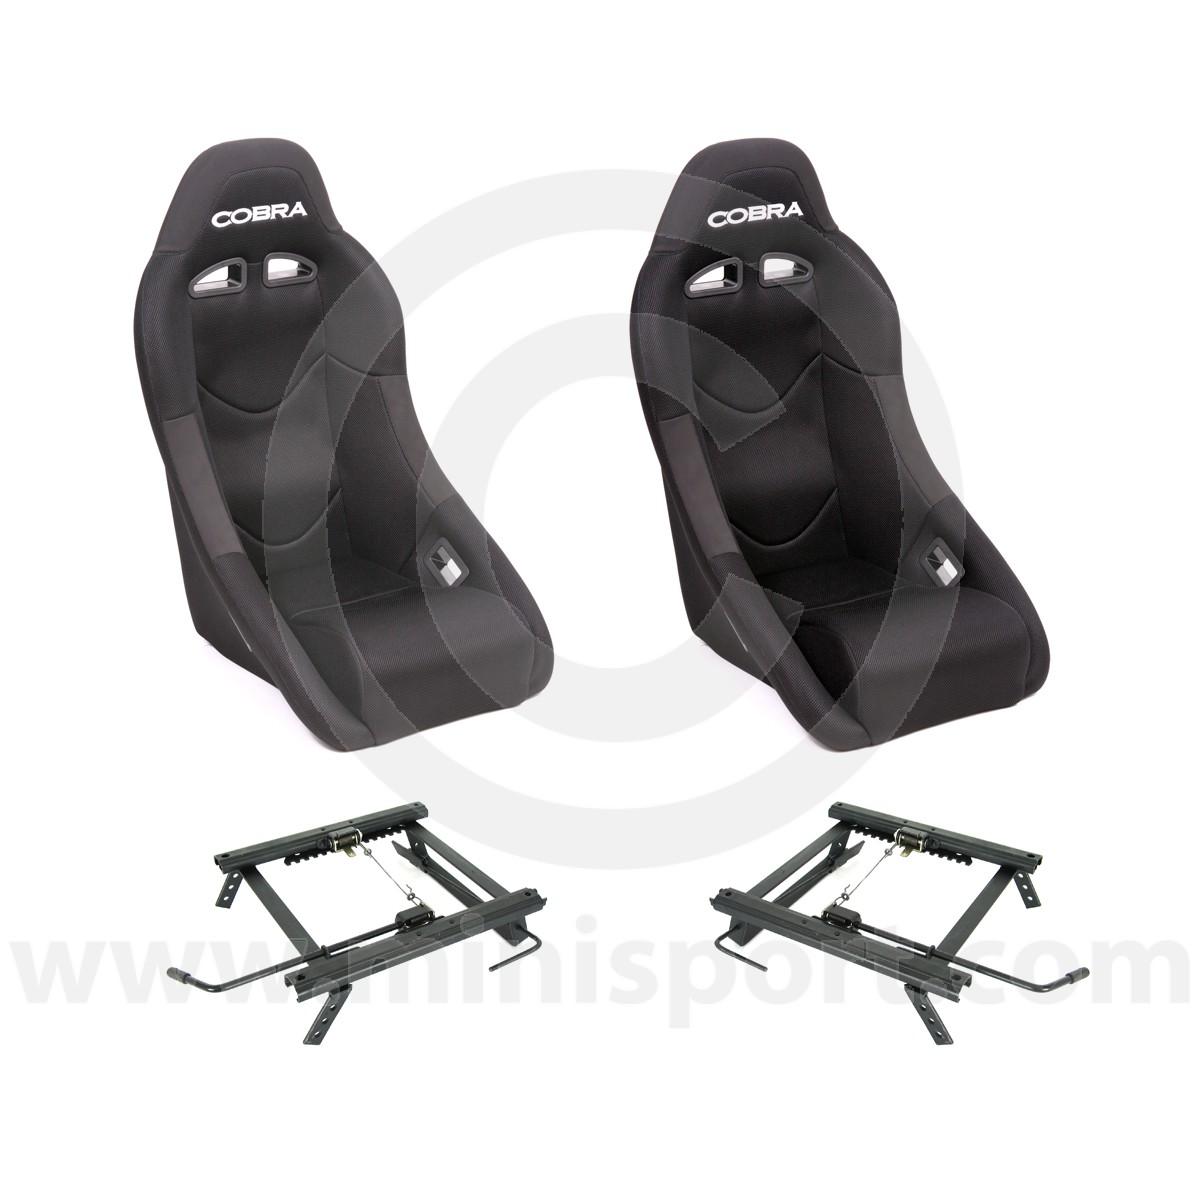 Cobra Clubman Seat Package - Black/Black Centre